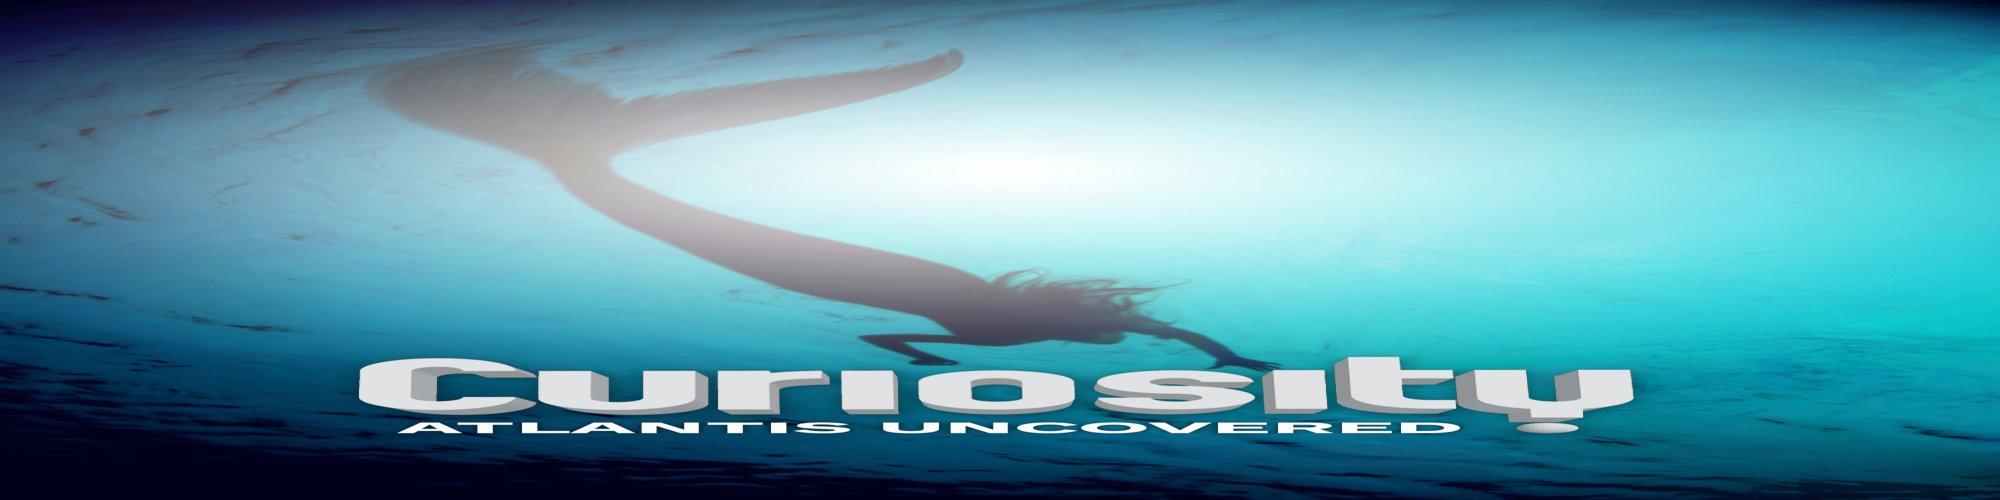 Curiosity: Atlantis Uncovered